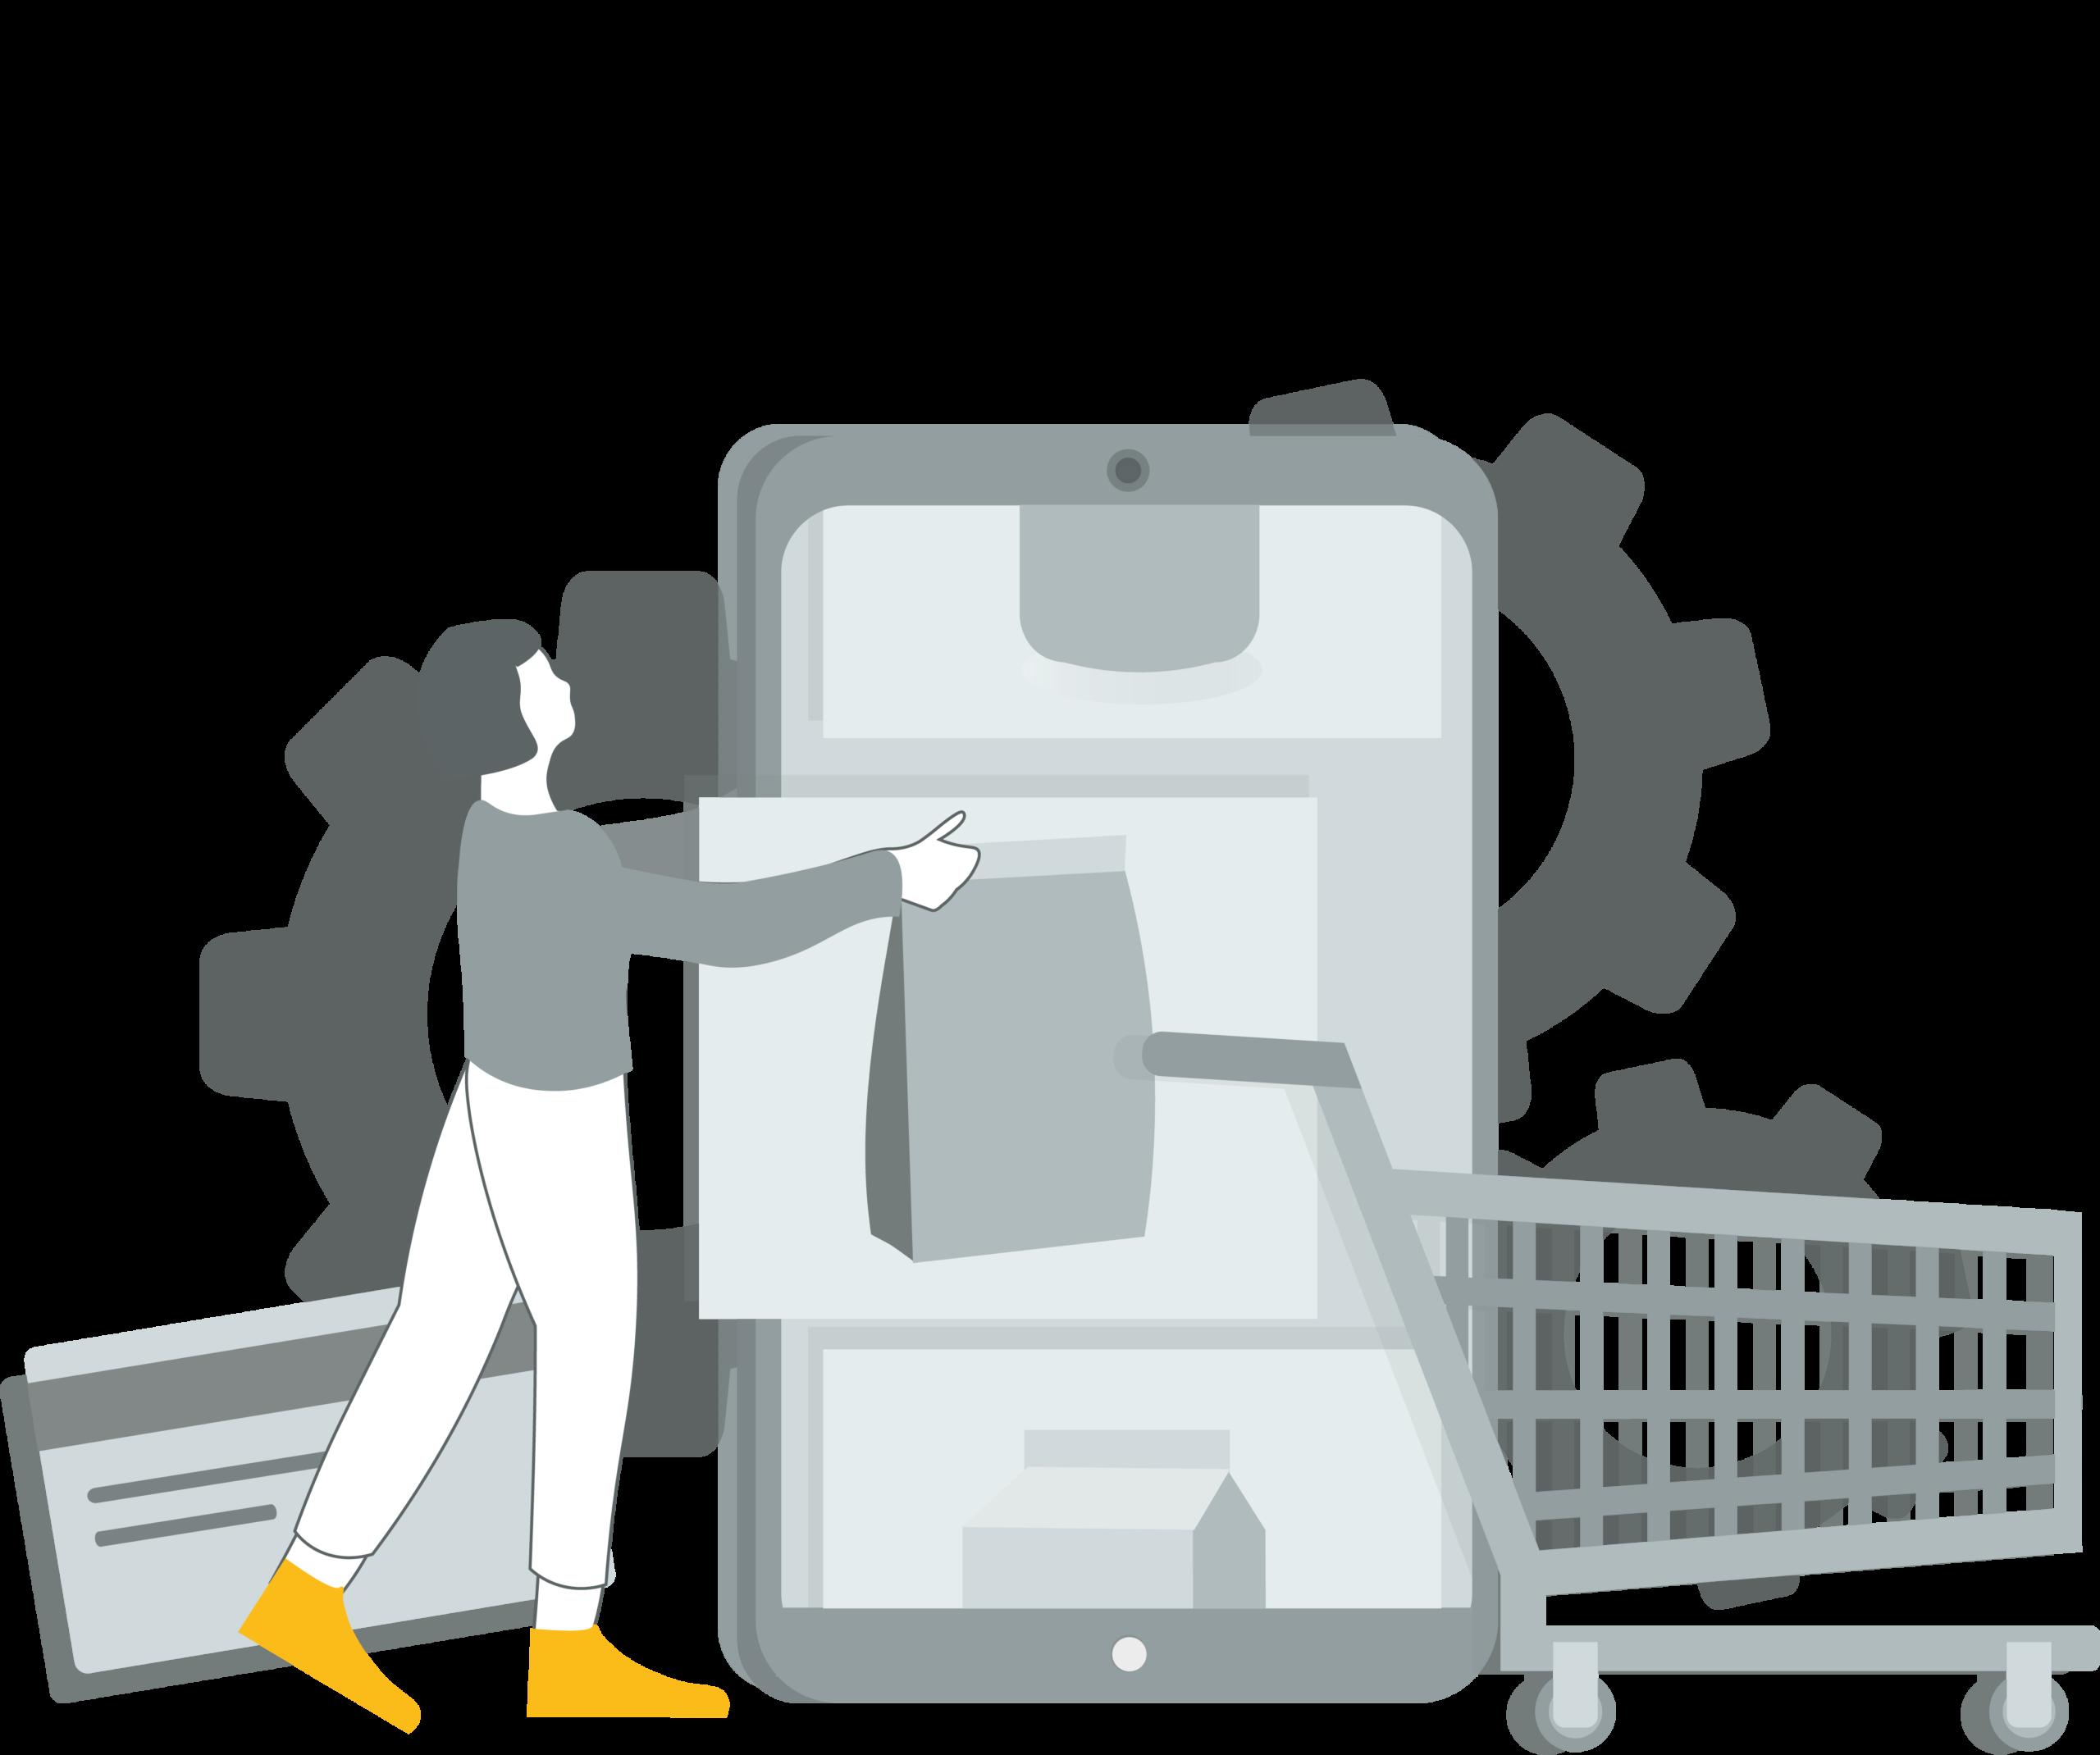 Ecommerce & Omnichannel team illustration